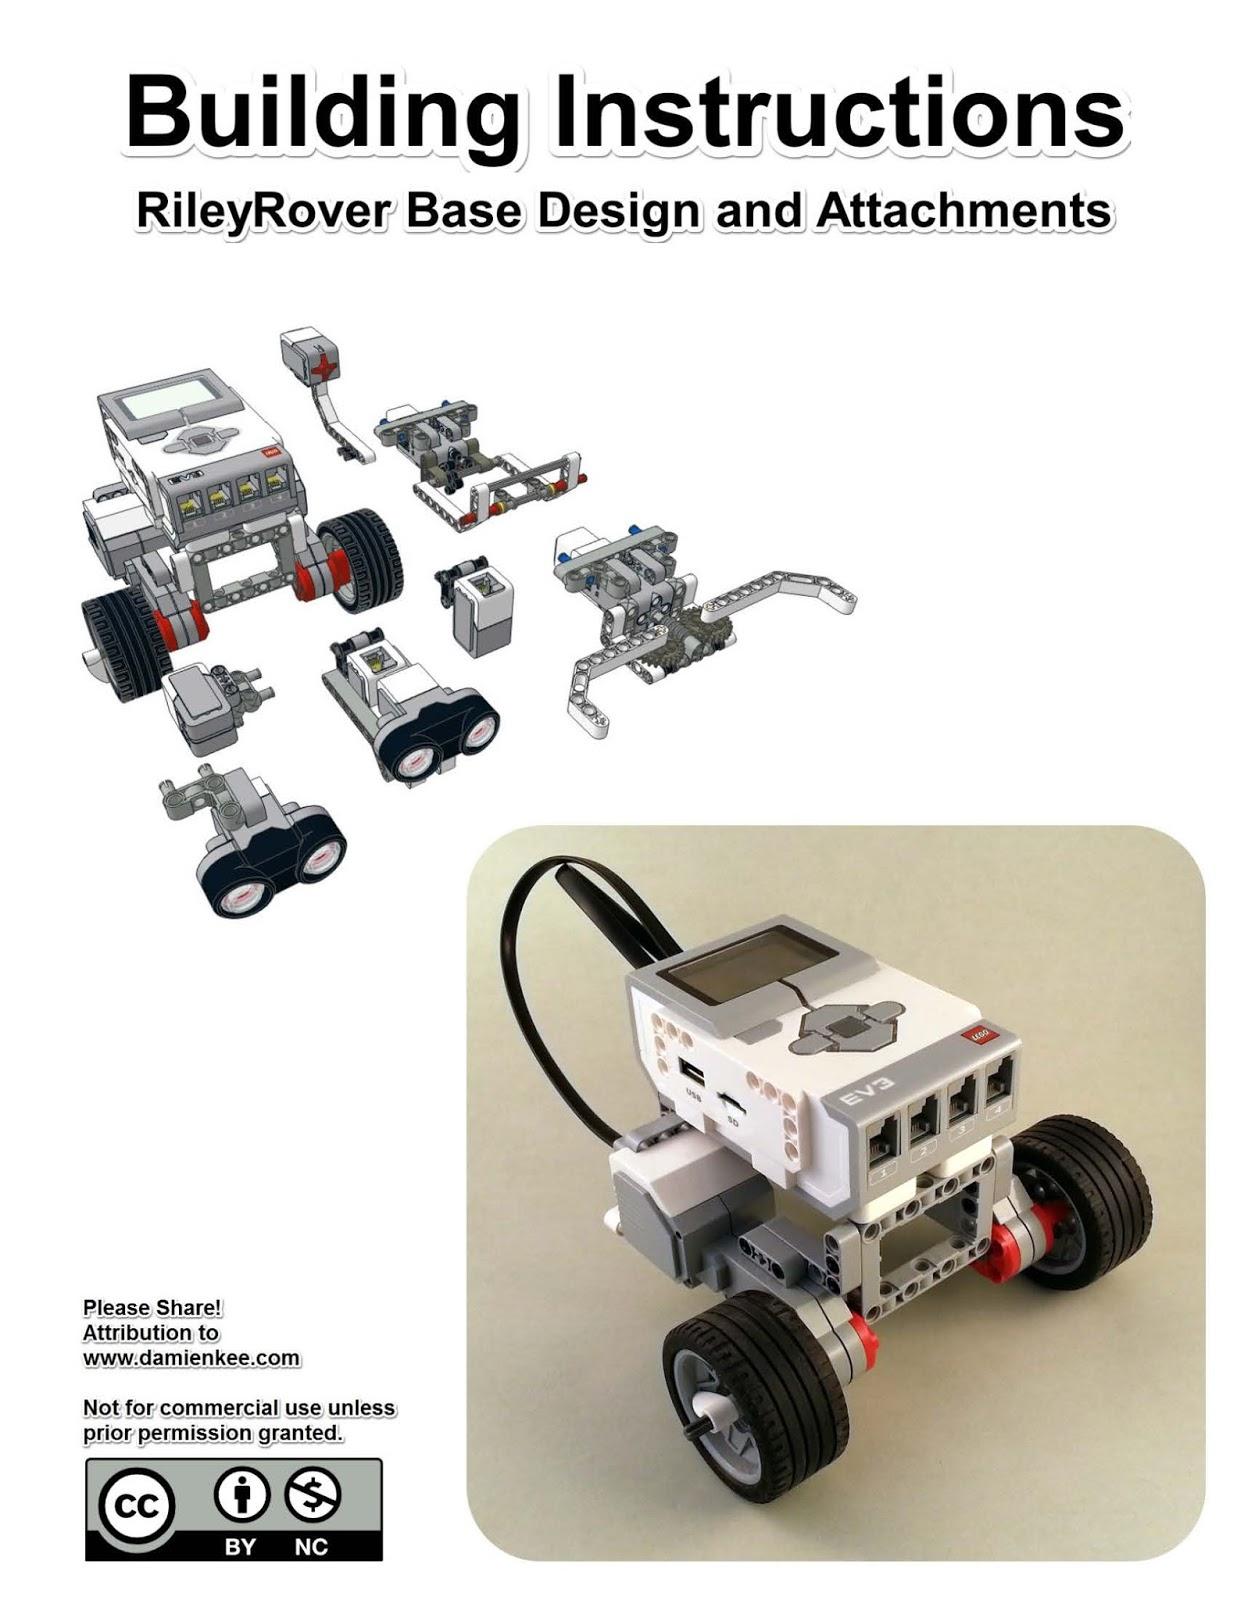 Robotics Education Centre Rileyrover